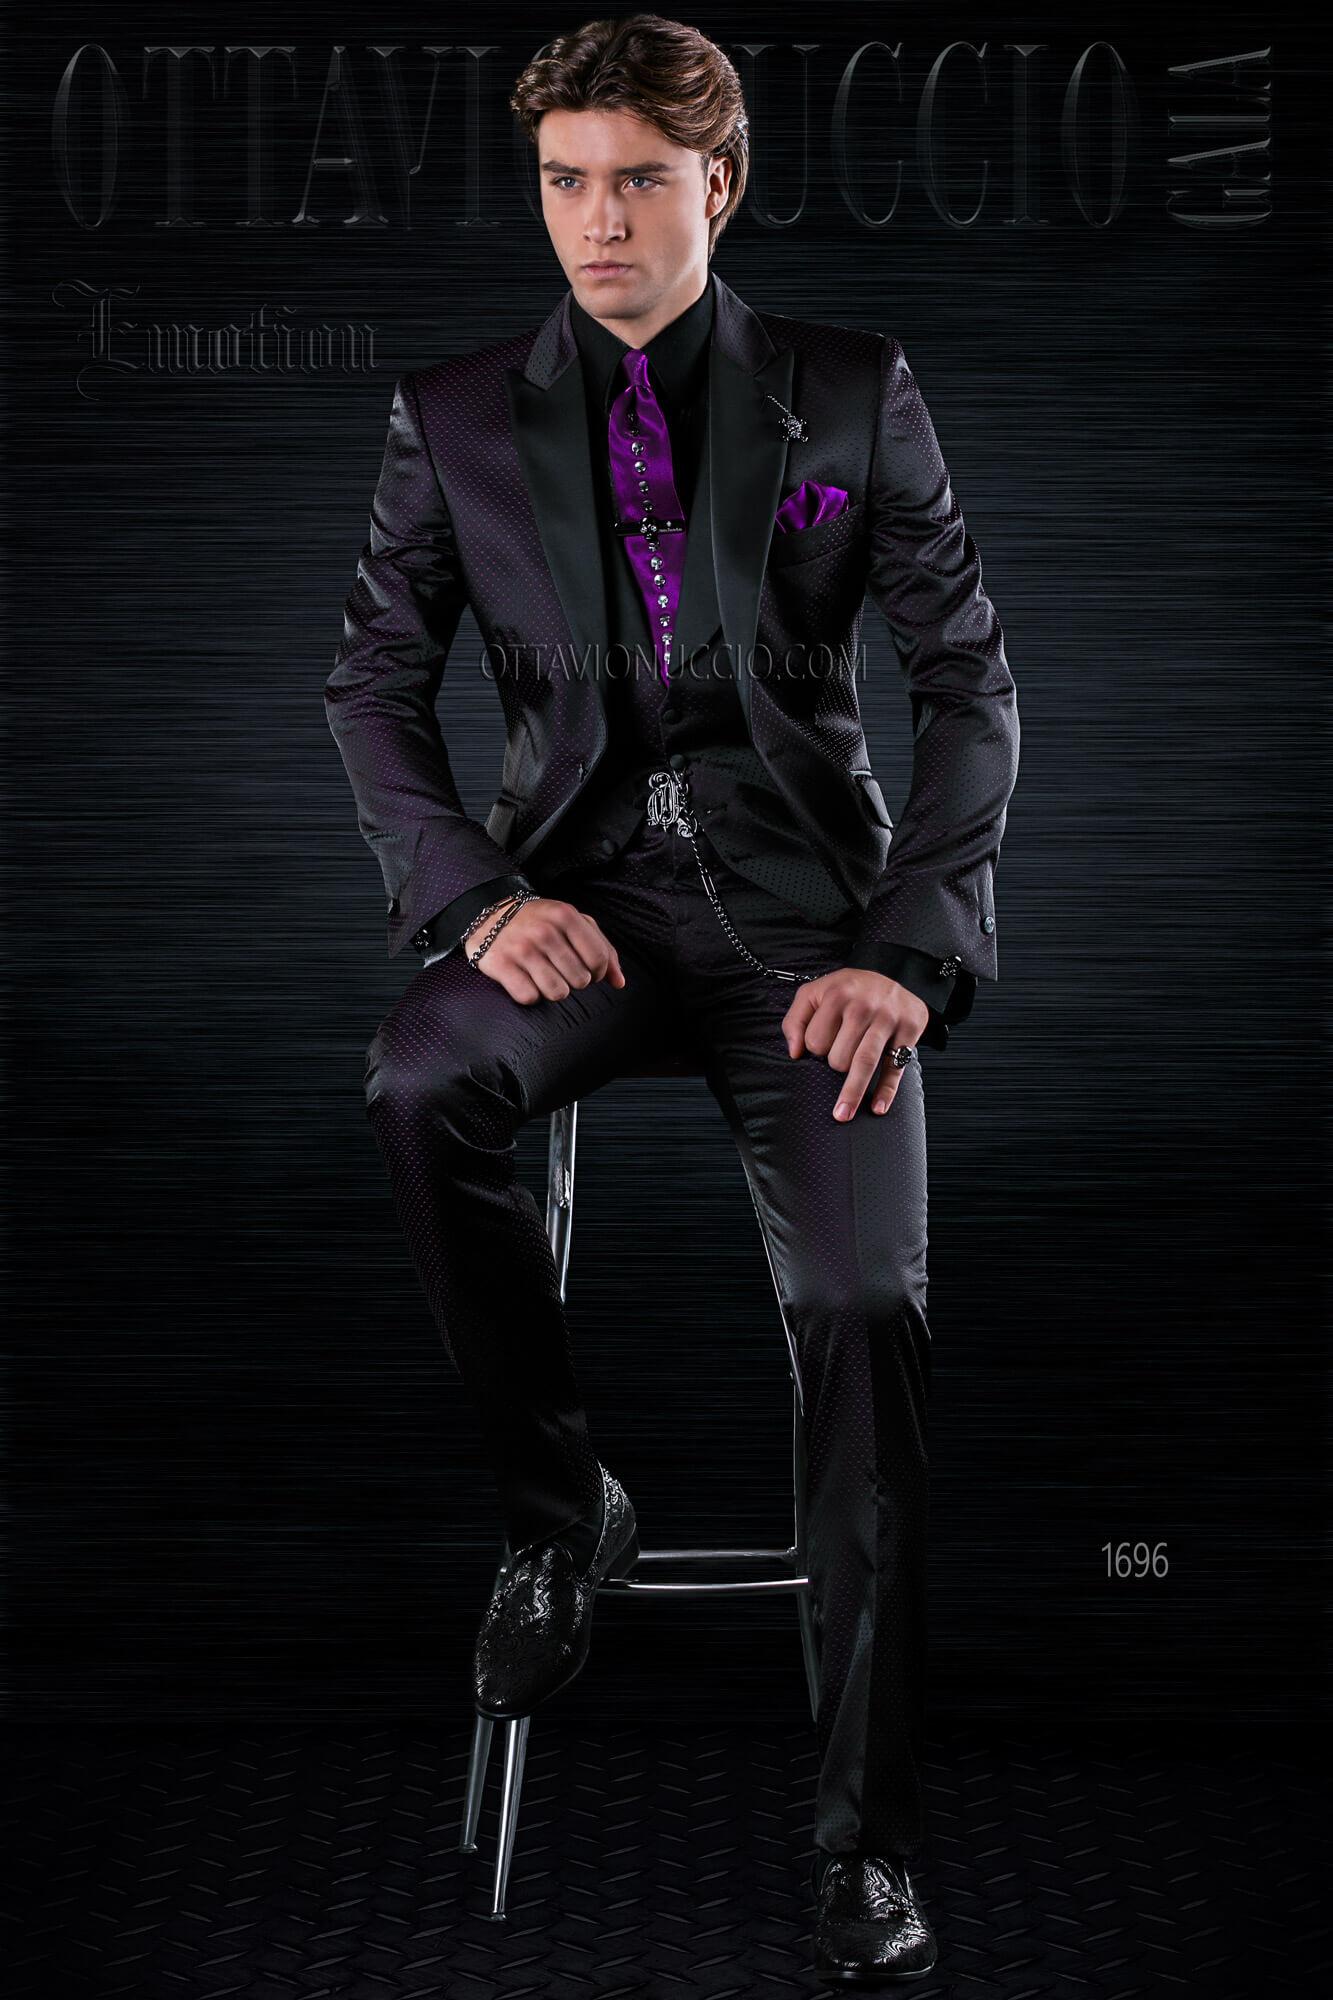 Black patterned Italian groom suit